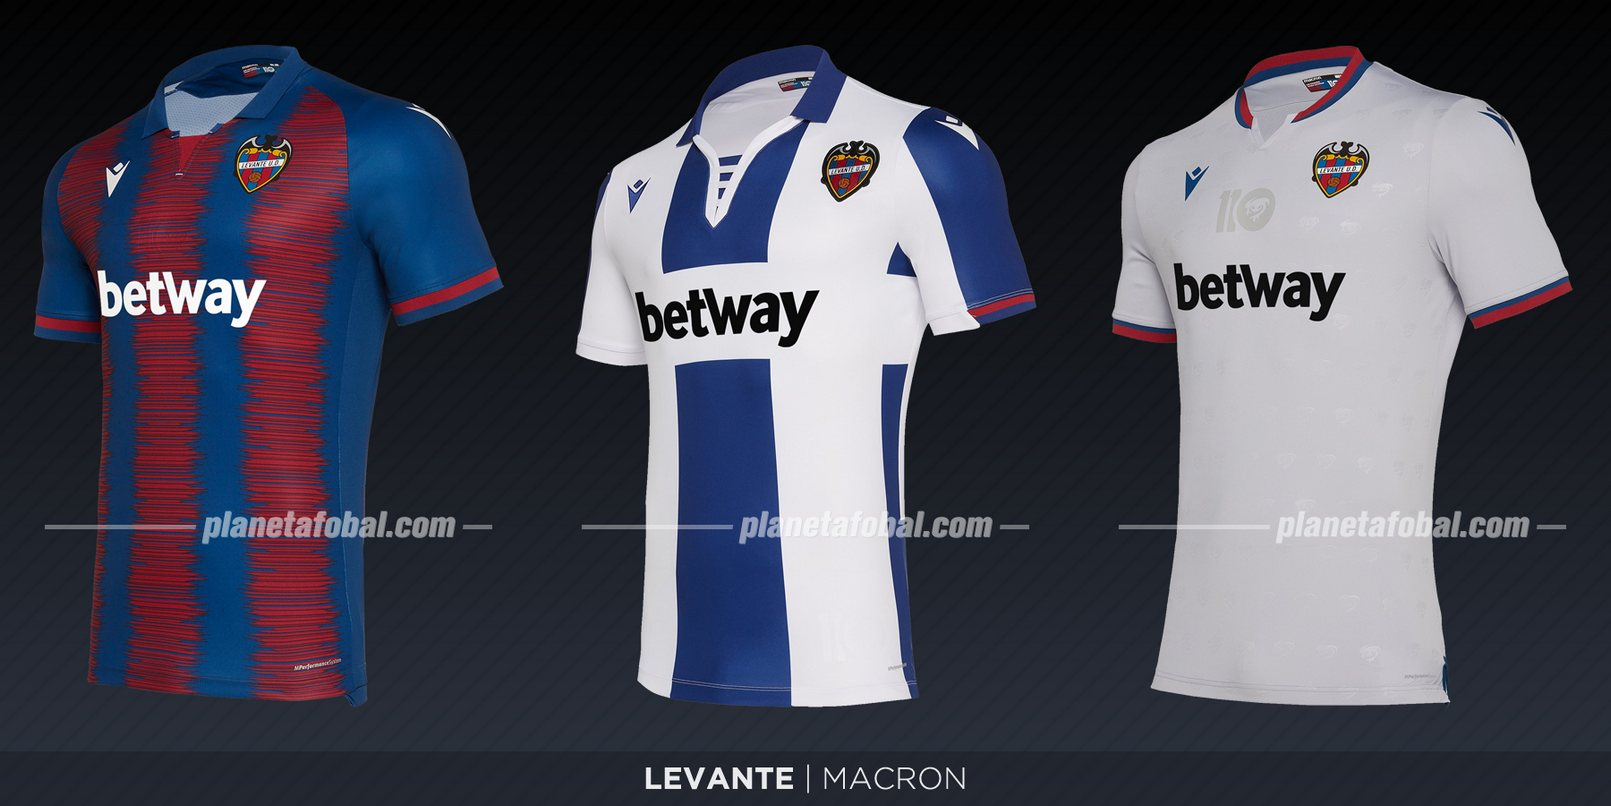 Levante (Macron) | Camisetas de LaLiga 2019-2020